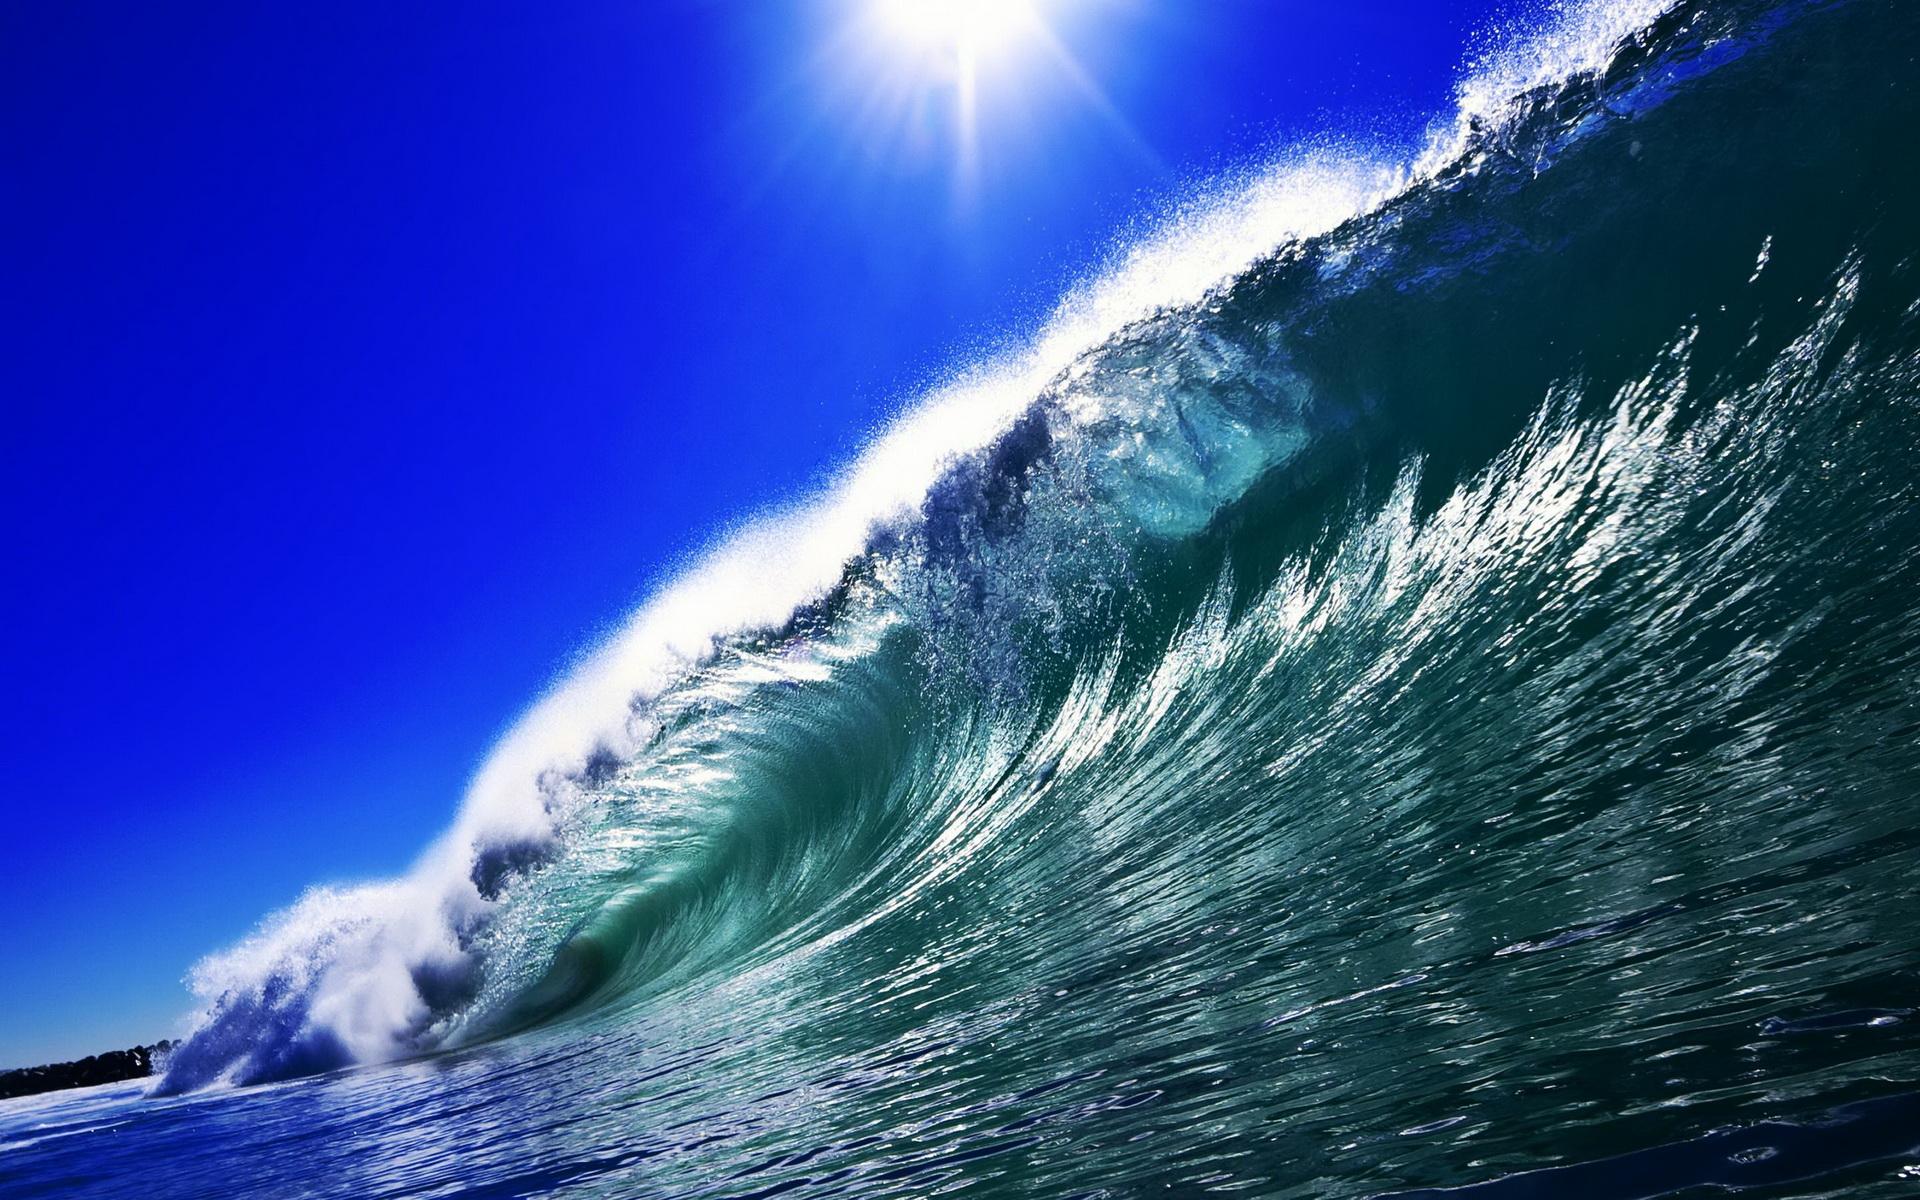 High Definition Wallpapers High: HD Wave Wallpaper